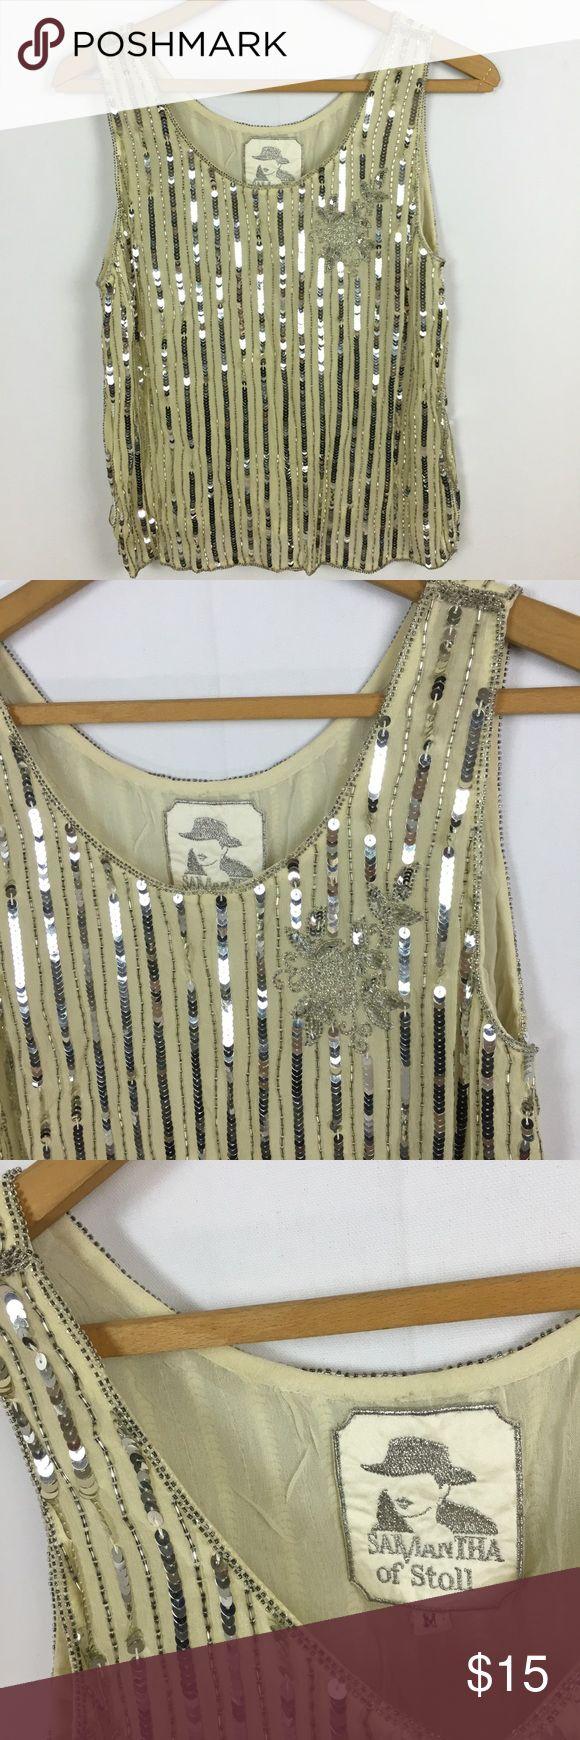 Vintage silk silver sequin tank top Samantha Stoll silk w/ silver sequins. Size medium. Tops Blouses